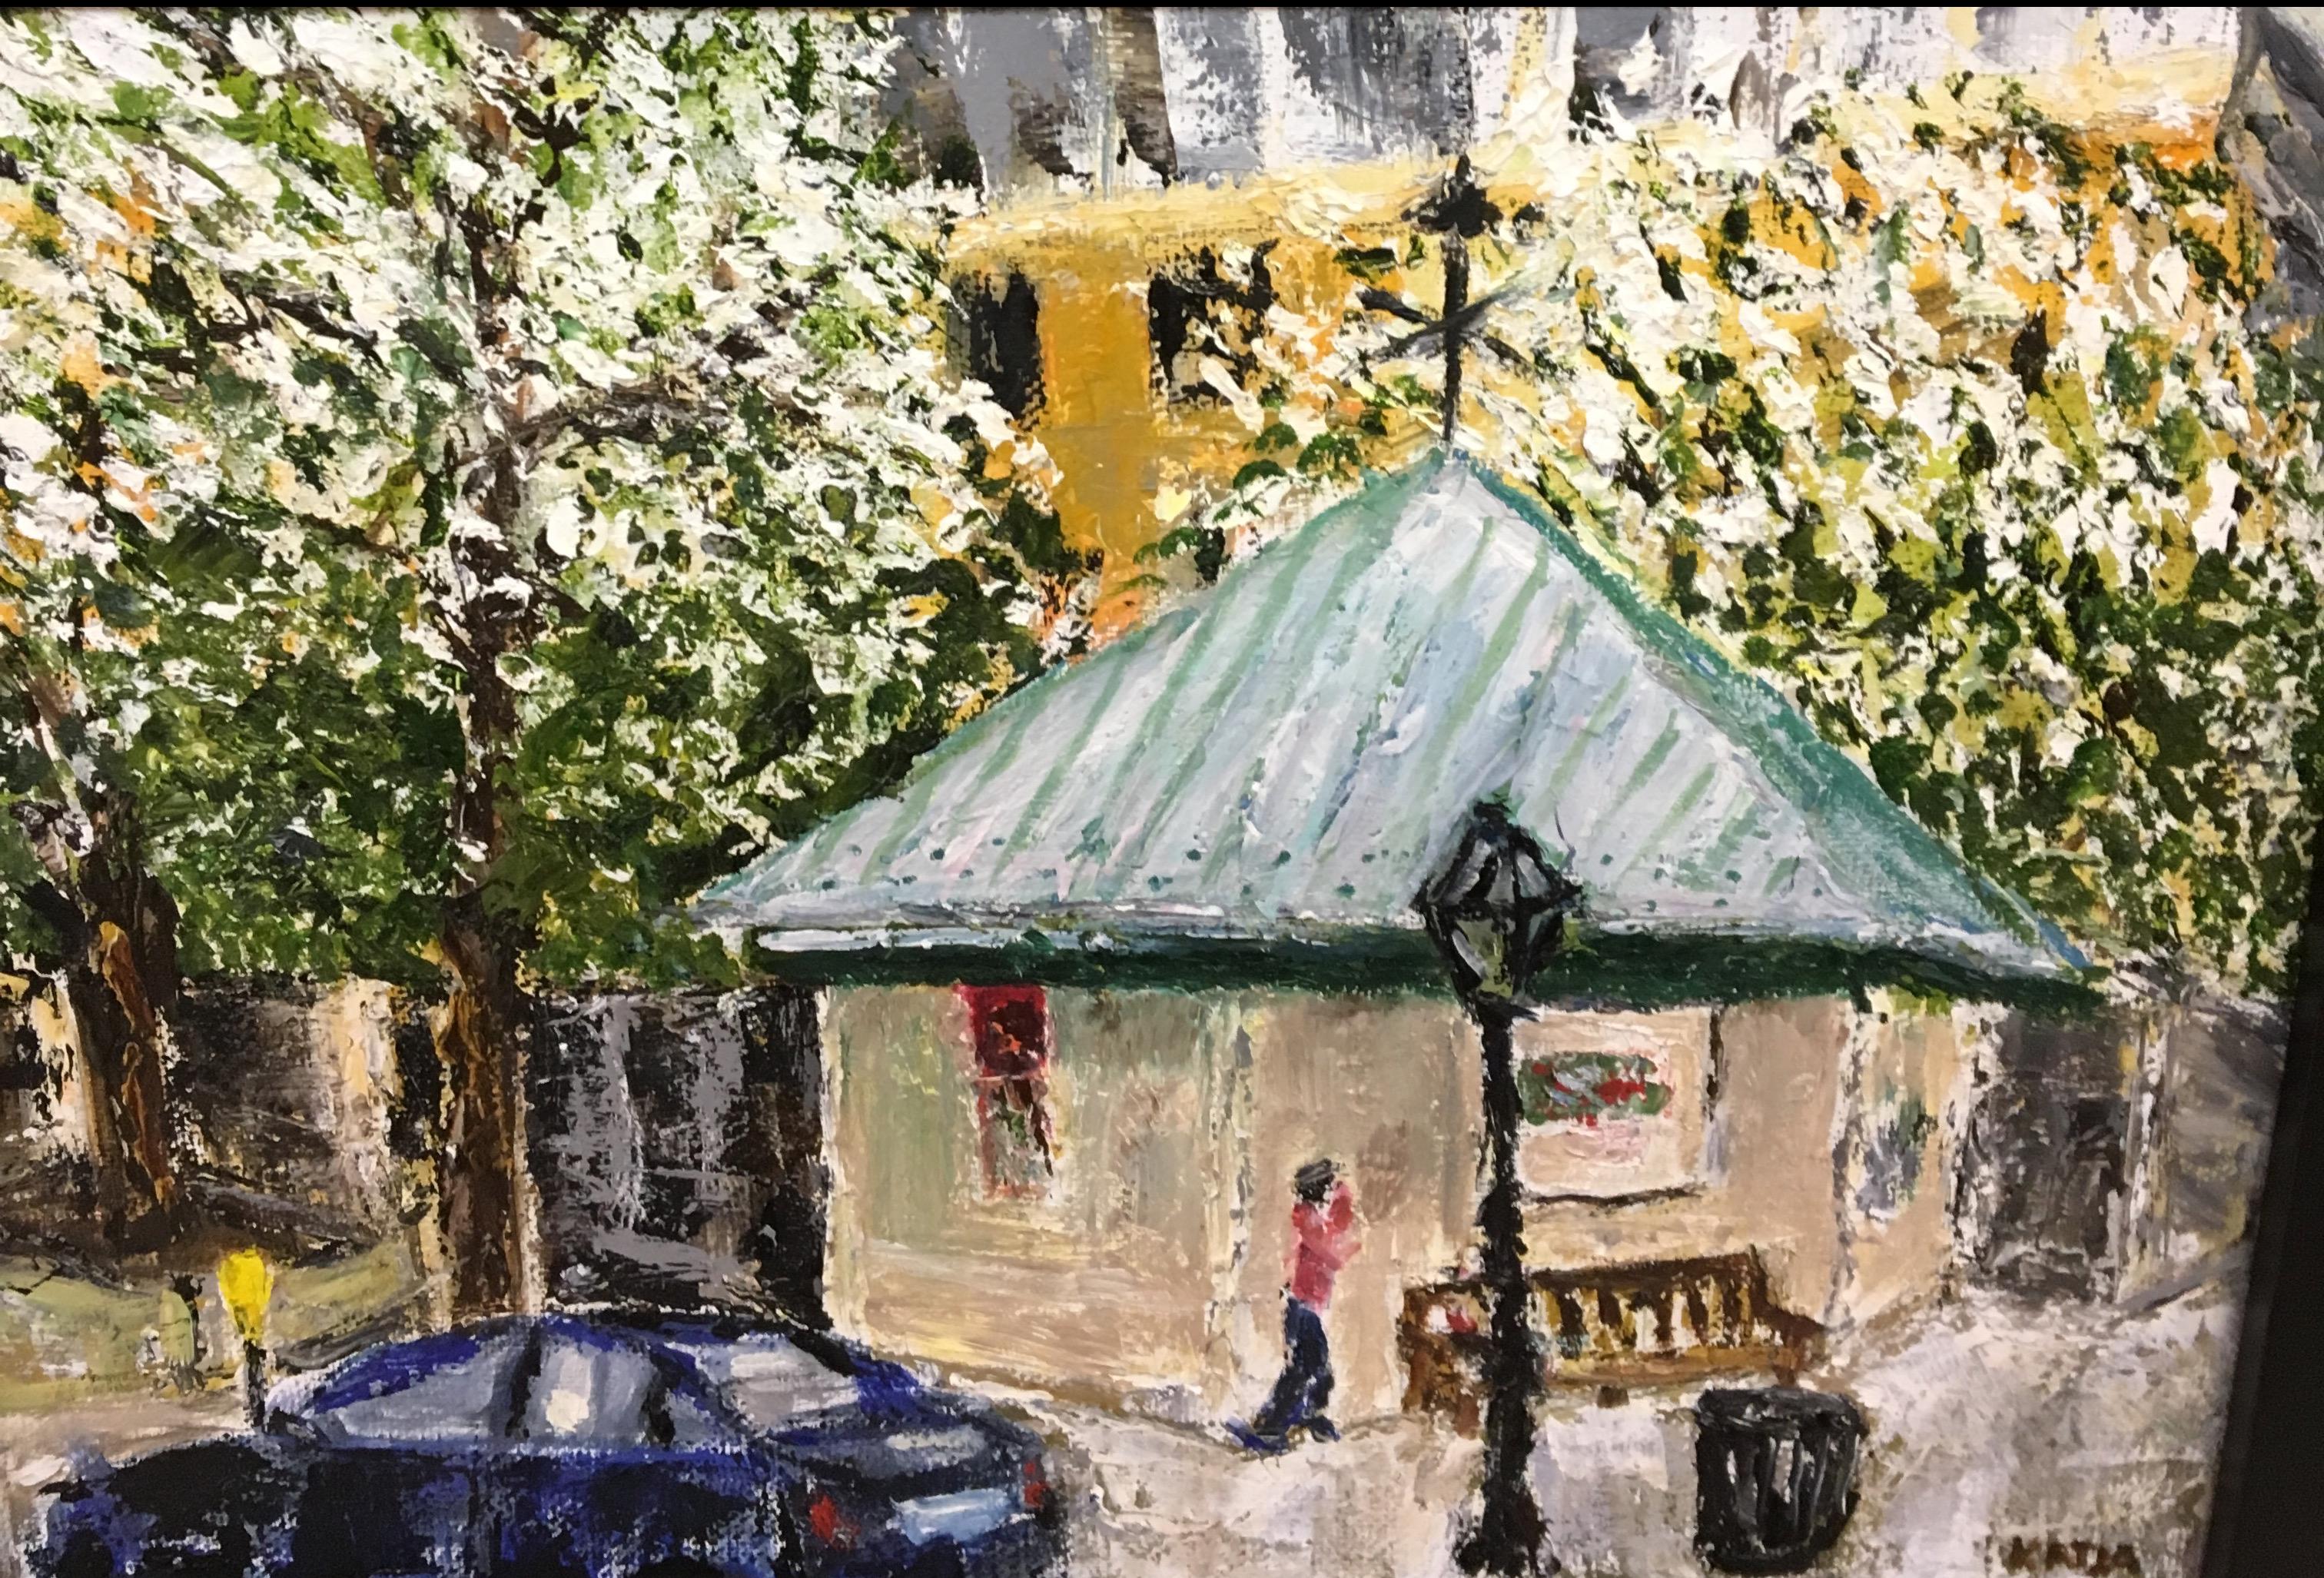 The Kiosk (Sold)